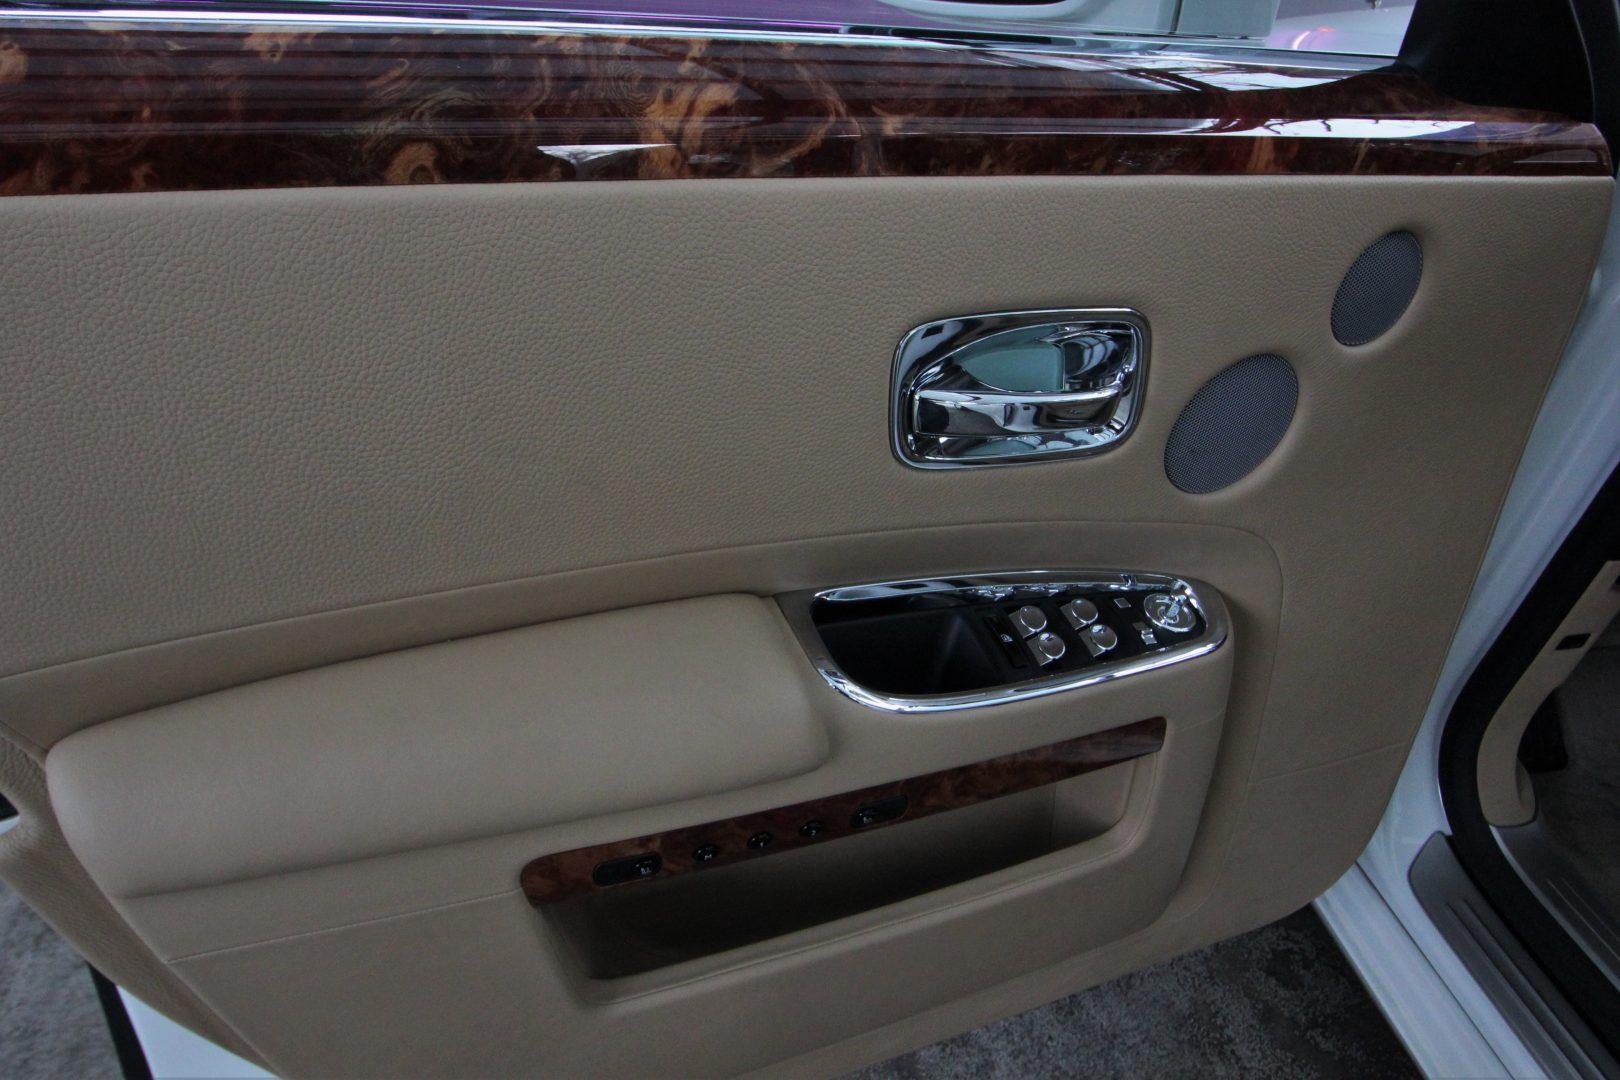 AIL Rolls Royce Ghost 6.6 V12  16